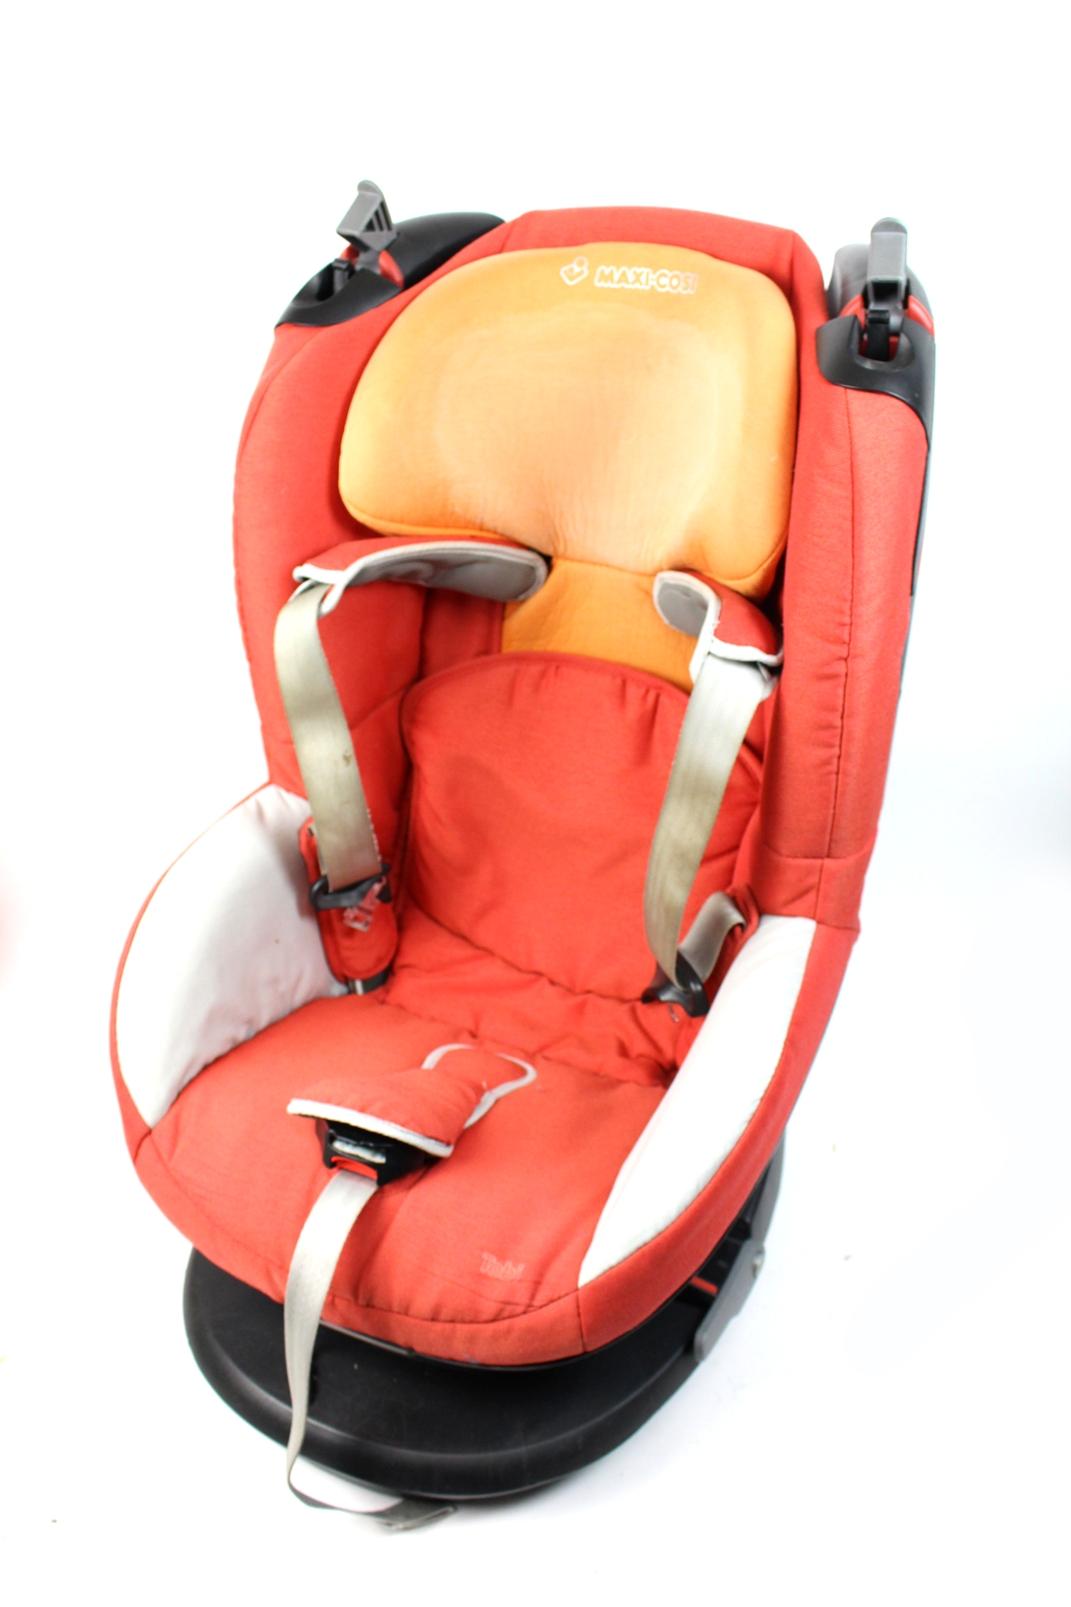 universal auto kinder sitz original maxi cosi tobi 9 18 kg. Black Bedroom Furniture Sets. Home Design Ideas